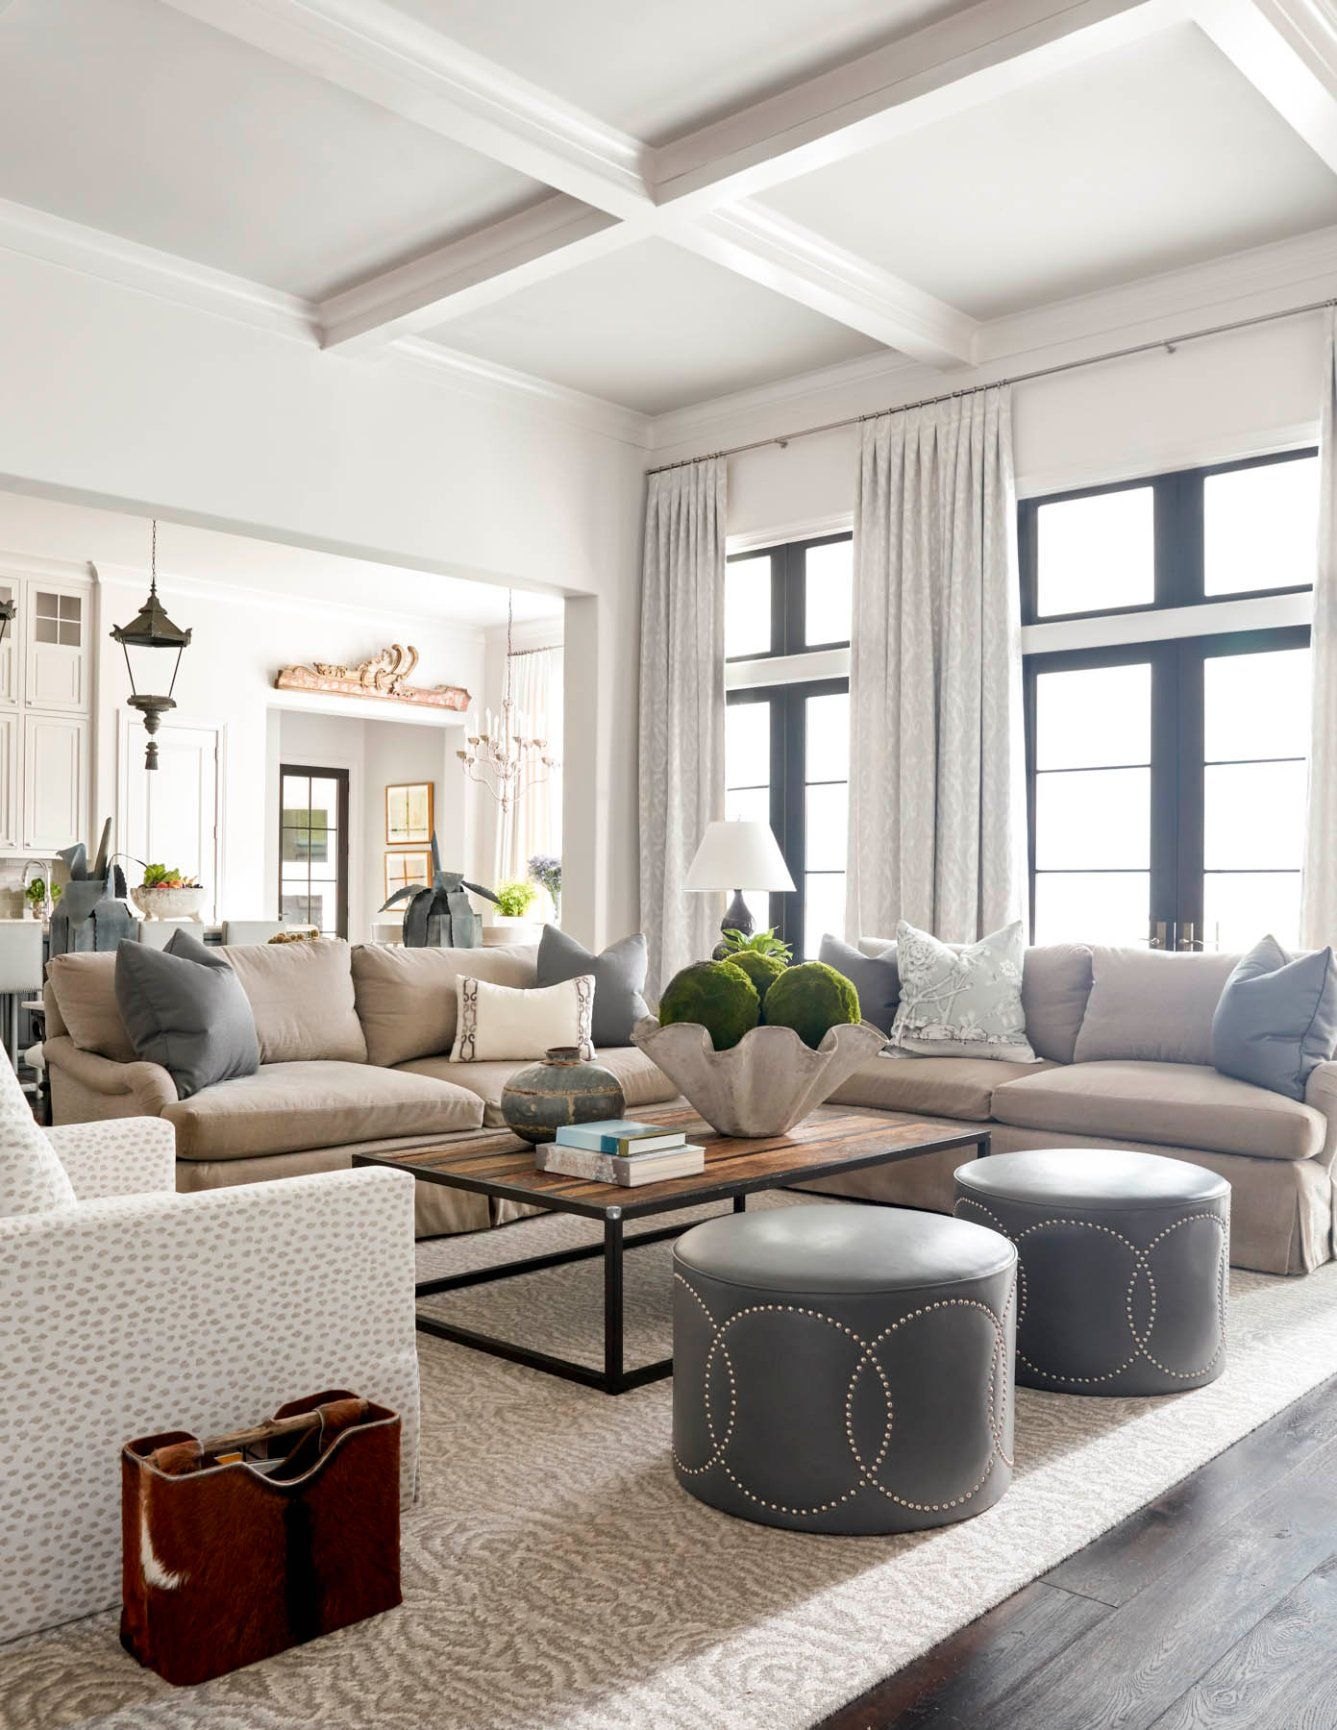 Merveilleux Memorial Interior Design | Dodson Interiors | Houston, TX